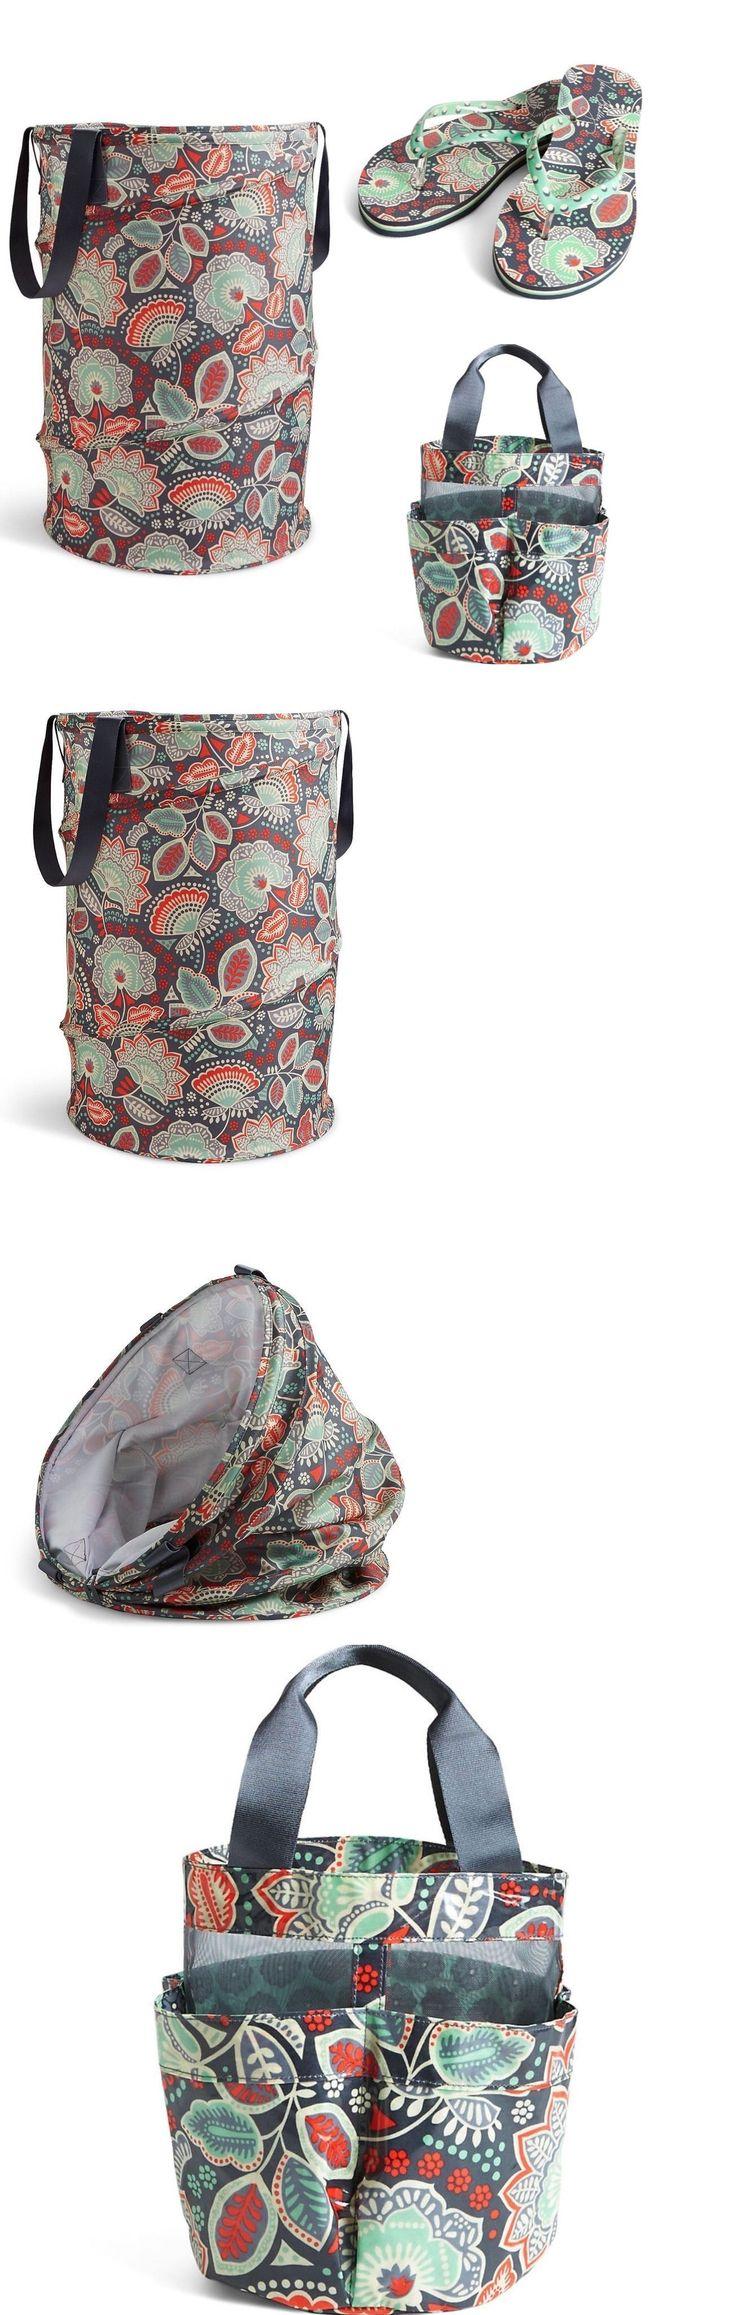 Vera Bradley Shower Curtains Ebay - Laundry bags 43516 vera bradley nomadic pop up laundry hamper and shower caddy dorm travel